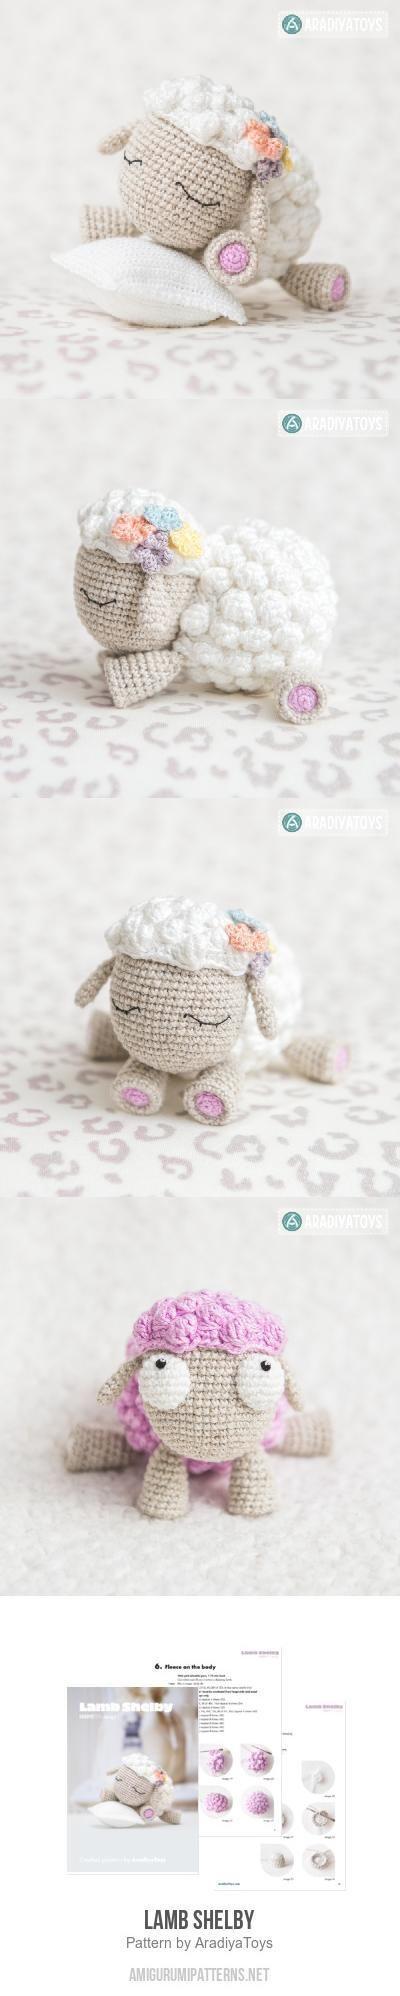 Lamb Shelby amigurumi pattern